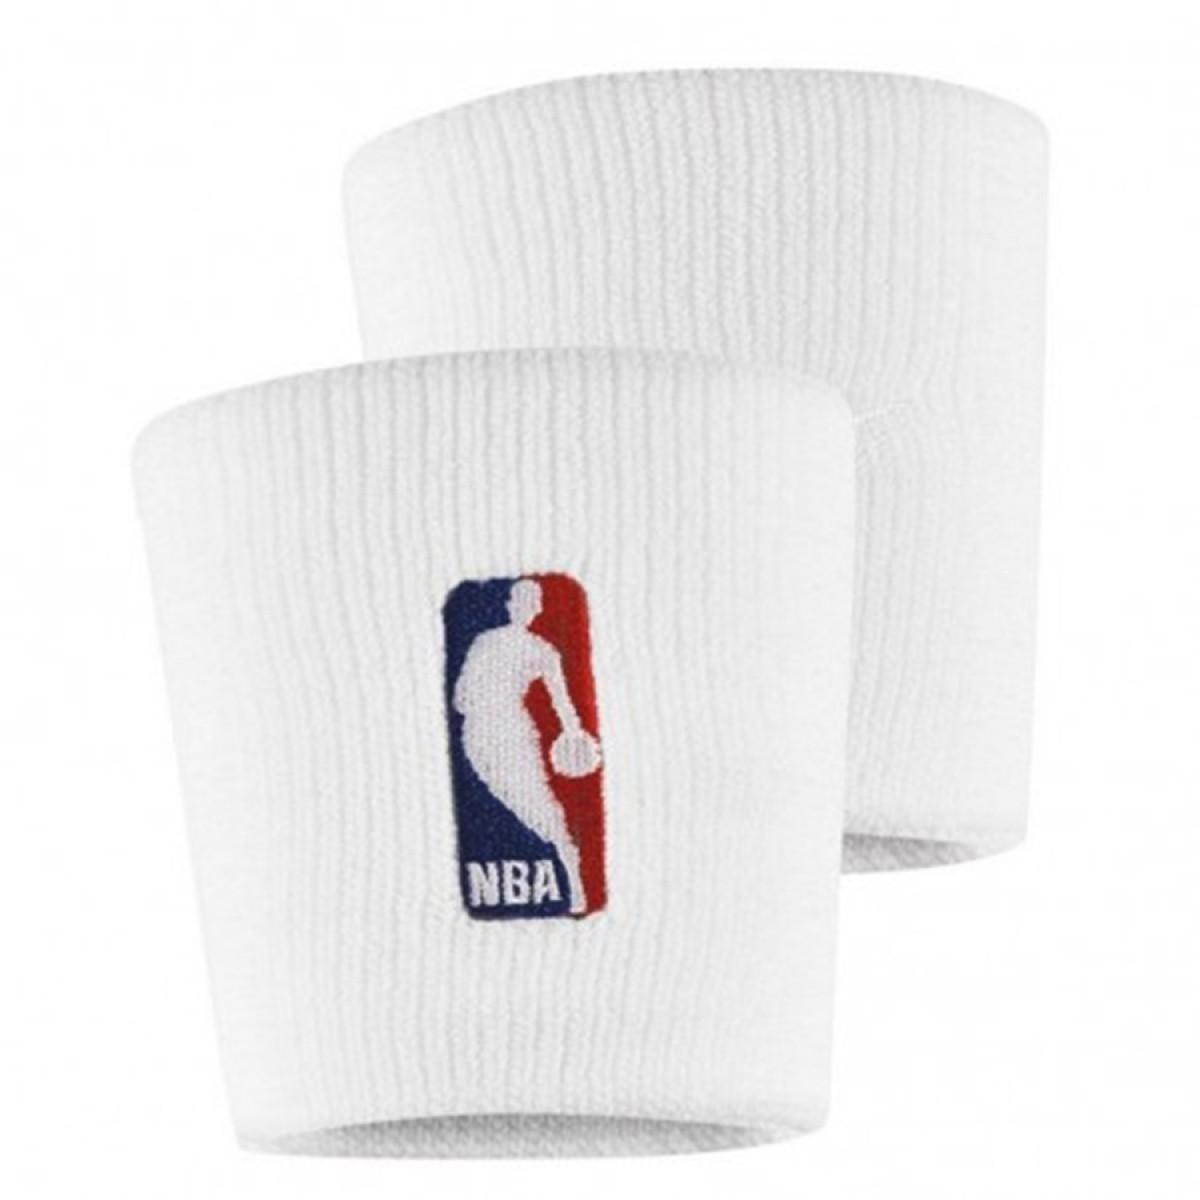 Nike Wristbands NBA 'White'